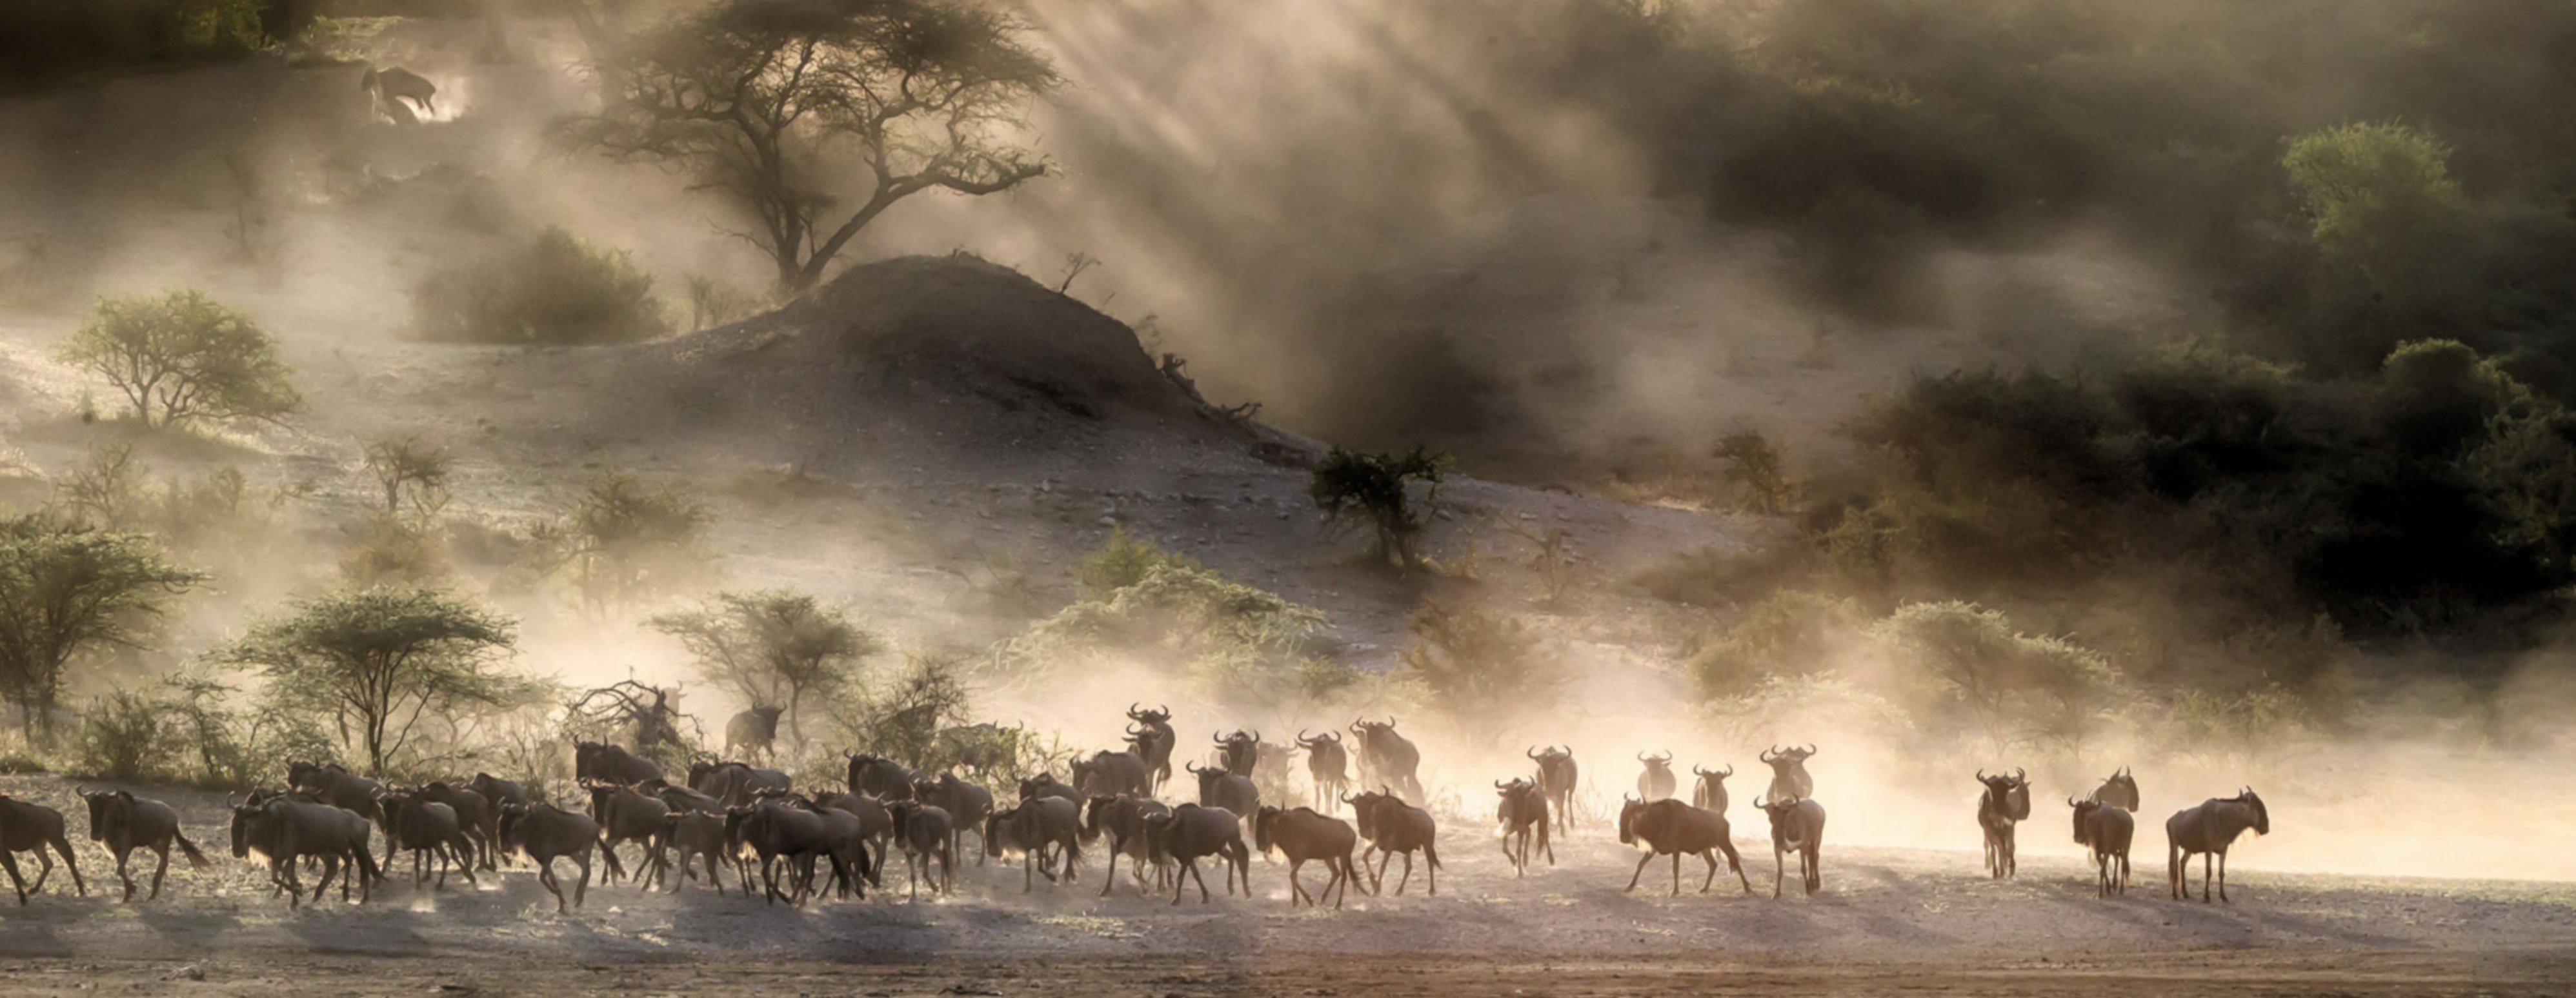 Great-migration-wildebeest